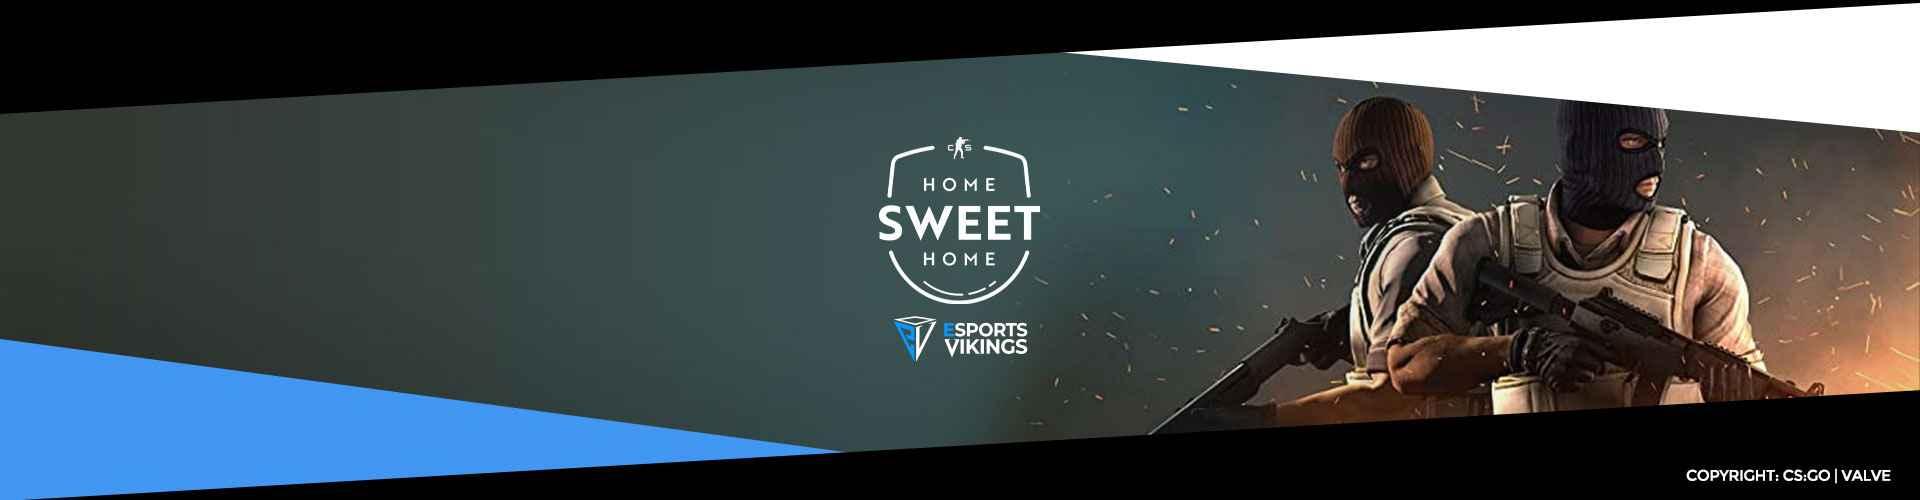 HomeSweetHome viikko 2: Pudotuspelit yhteenveto